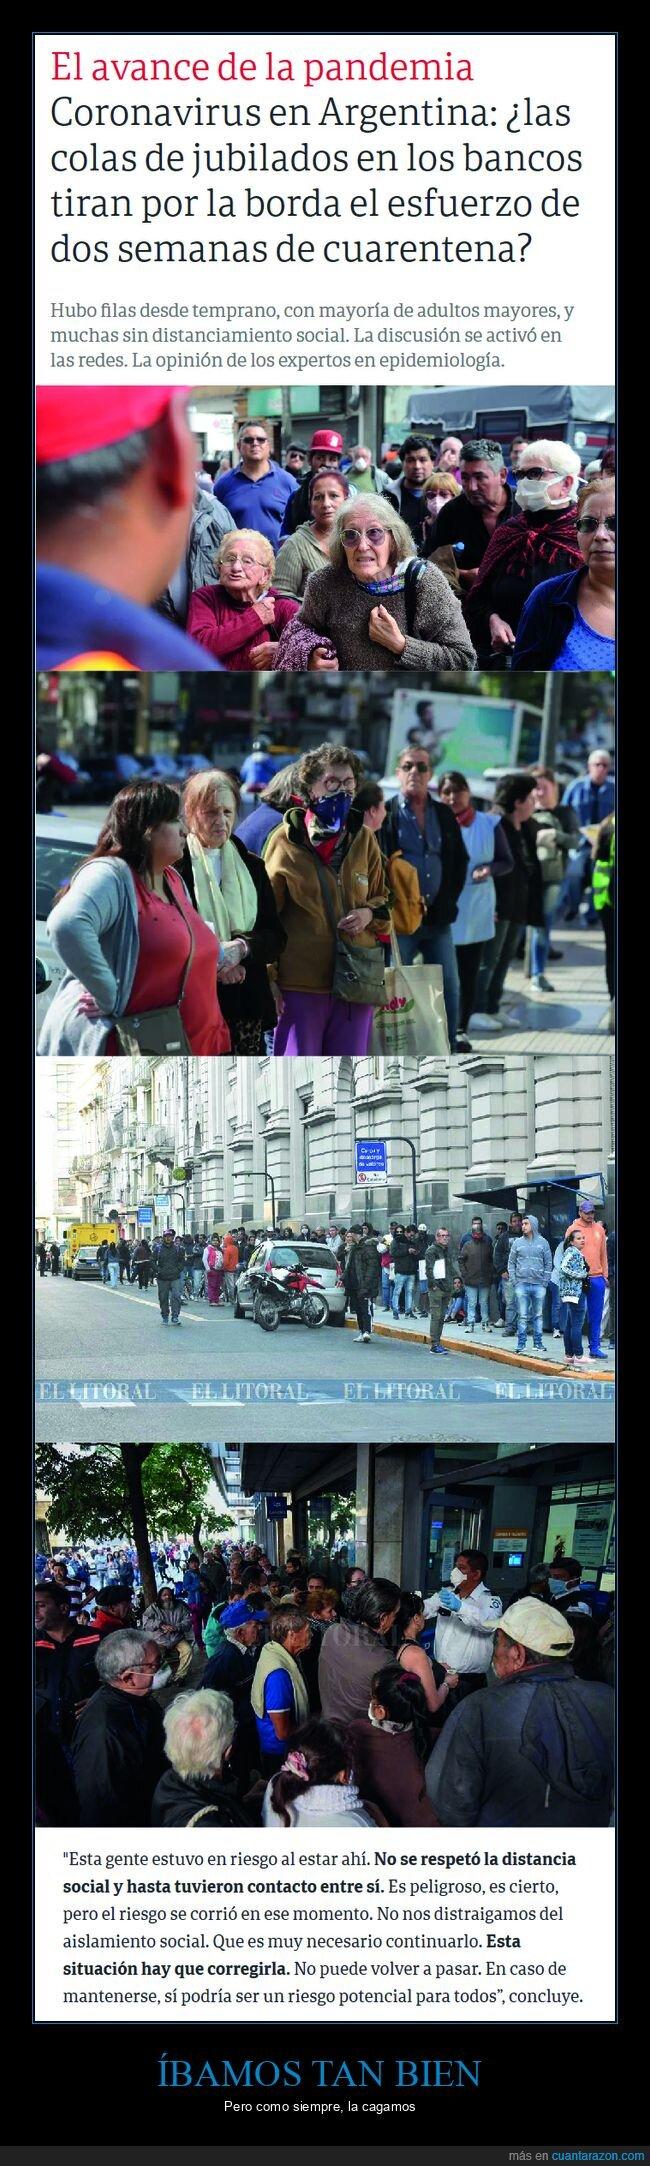 argentina,bancos,coronavirus,cuarentena